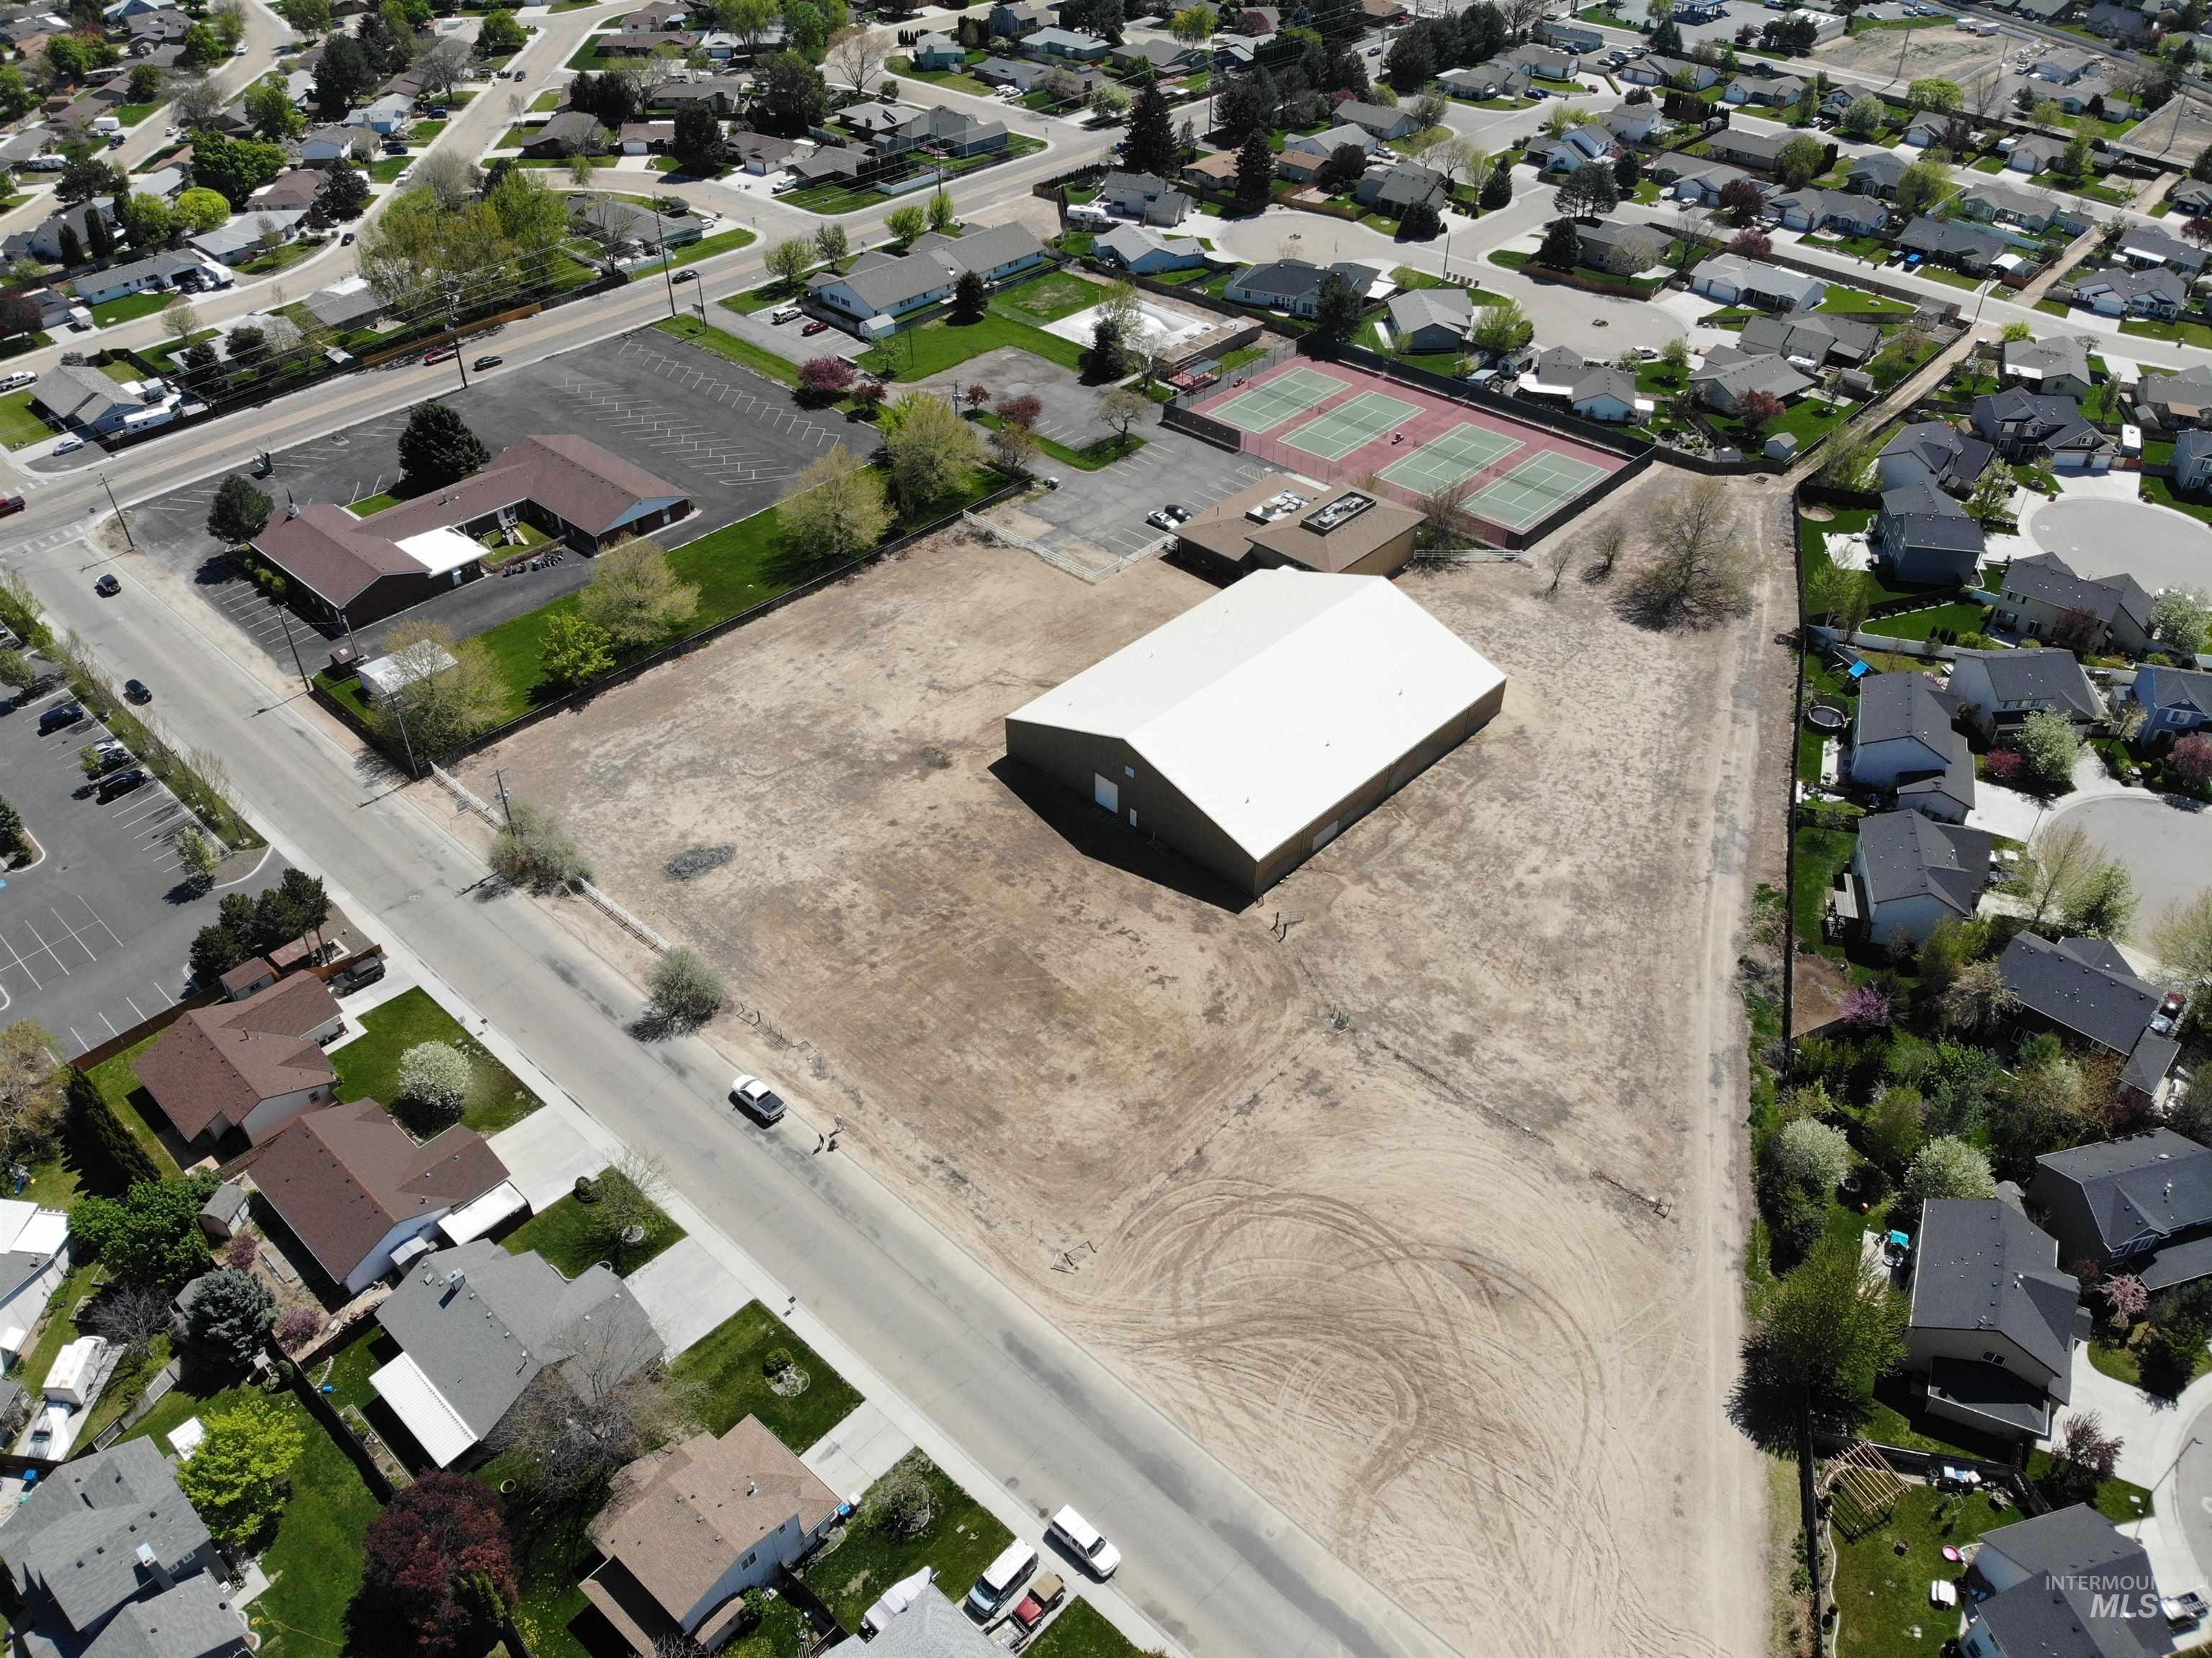 63 S Midland Property Photo